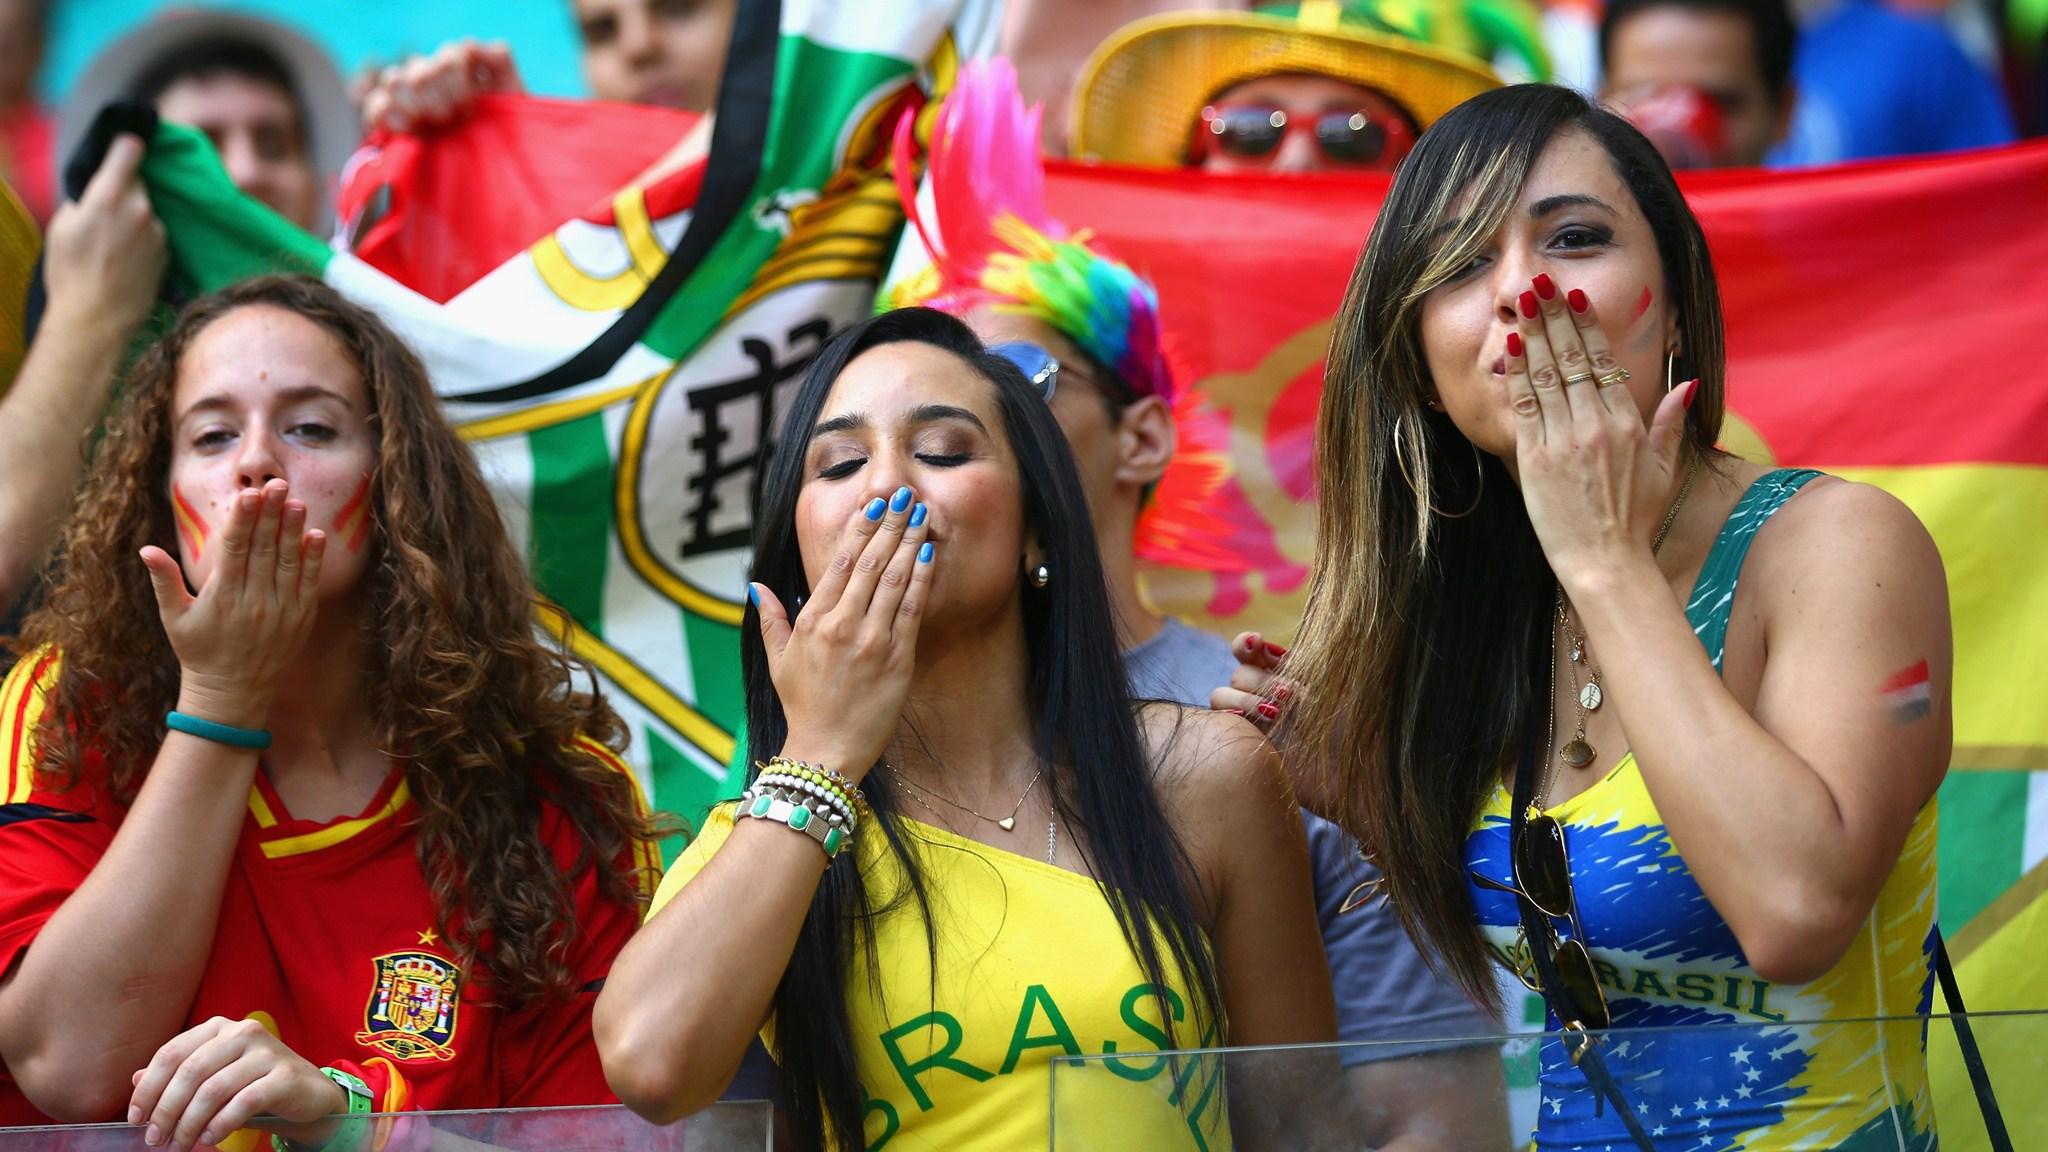 156 - Spain-Netherlands [1-5] -- 13 Jun 2014 - 16-00 -- Salvador - Arena Fonte Nova